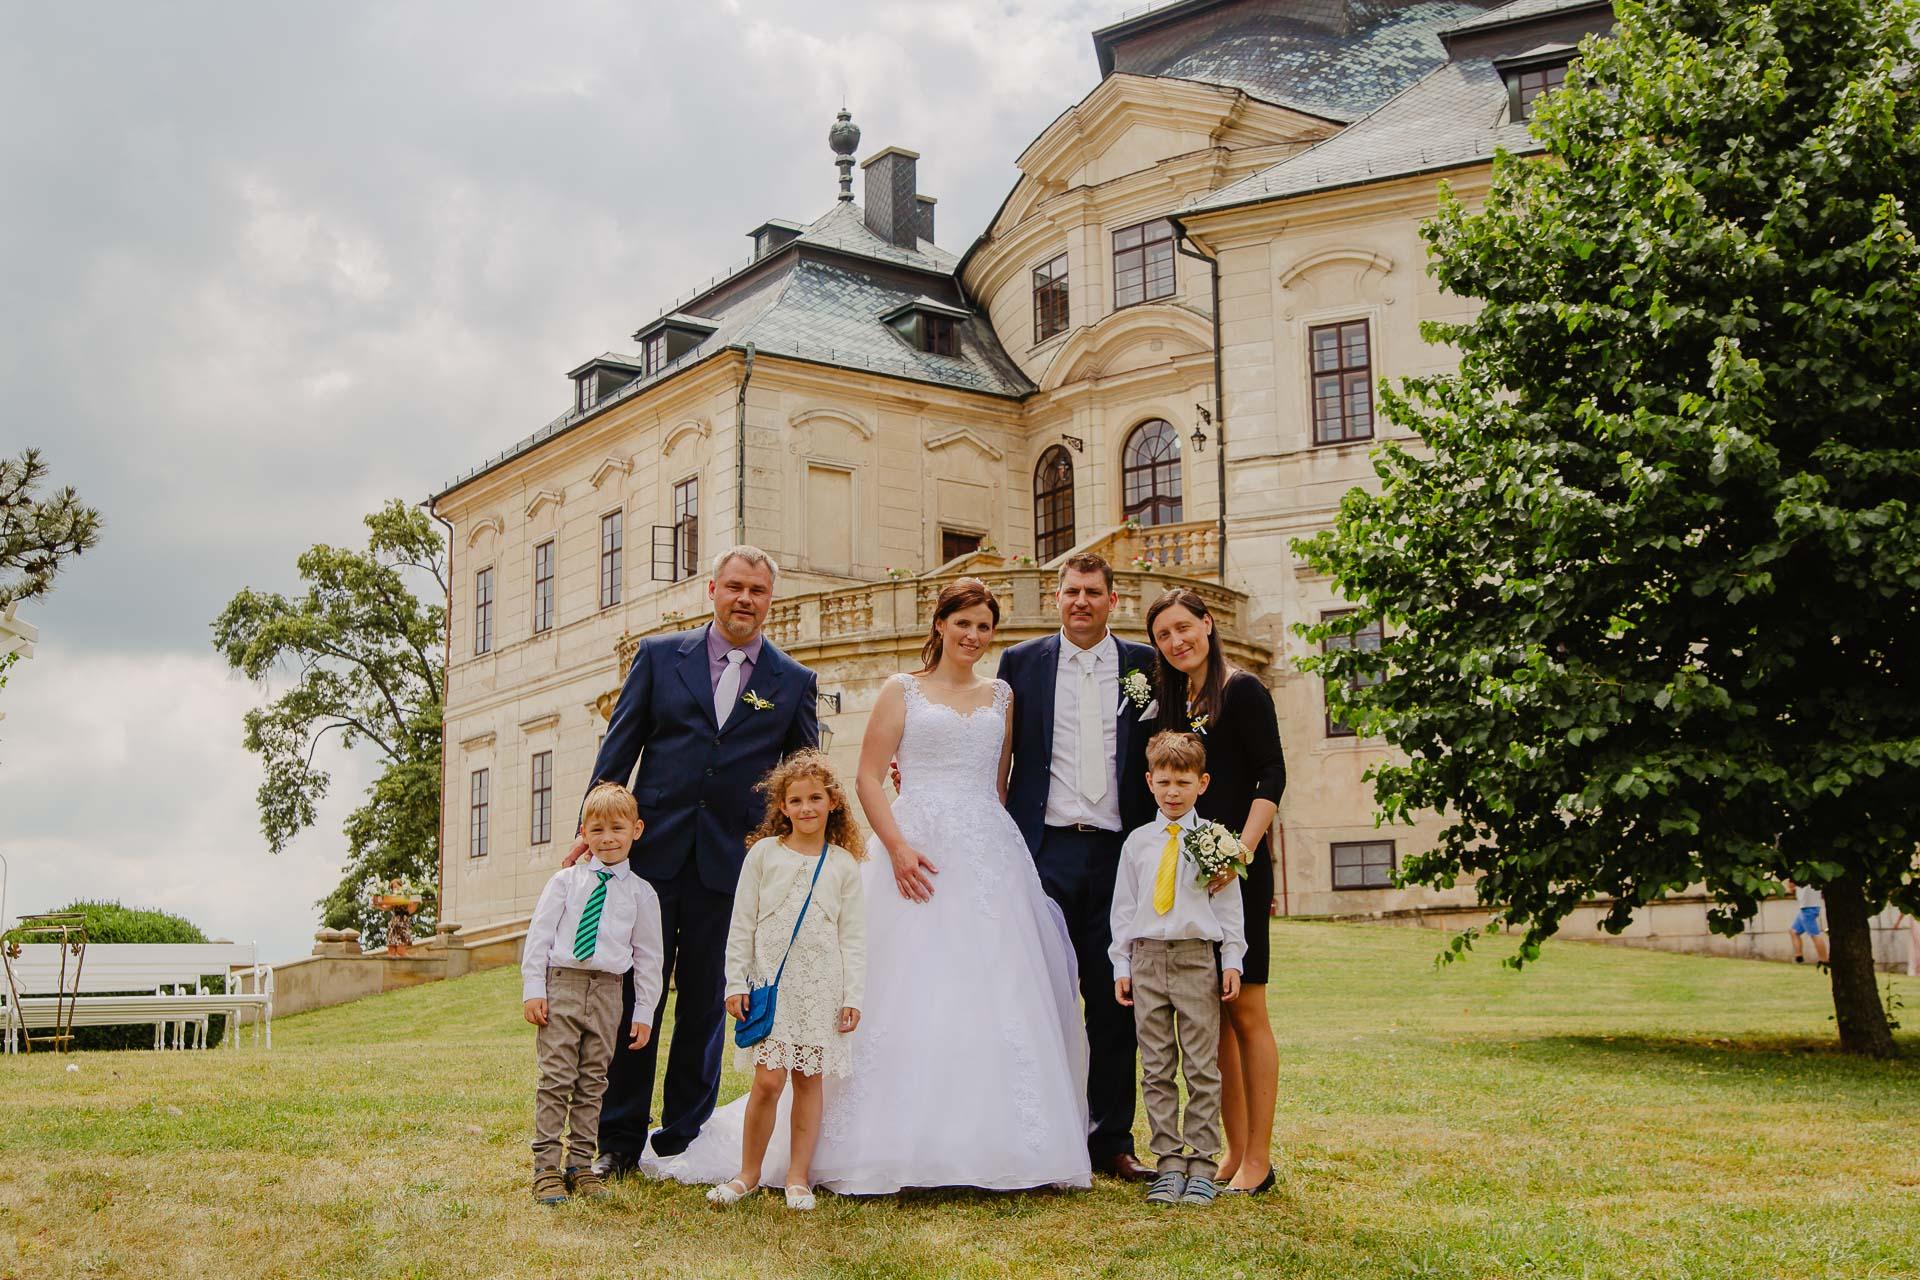 Svatební-fotograf-zámek-Karlova-Koruna-Chlumec-nad-Cidlinou-142